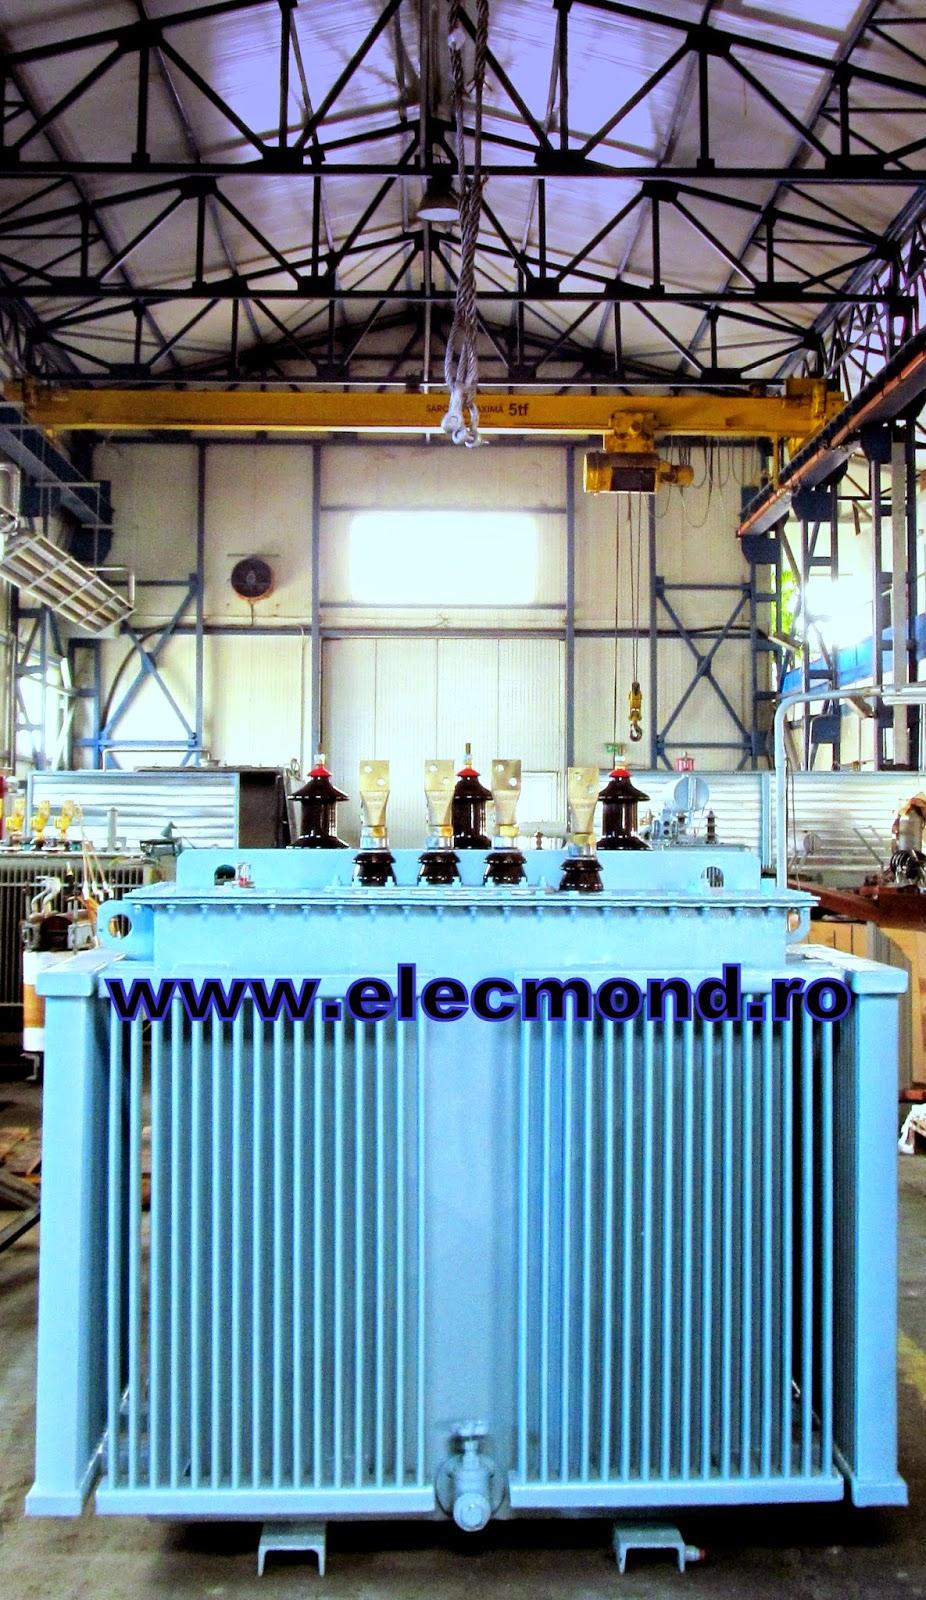 transformator , transformatoare , transformatoare din stoc , elecmond , elecmond blog , transformatoare electrice , transformatoare de putere , reparatii transformatoare , transformator 630 kVA